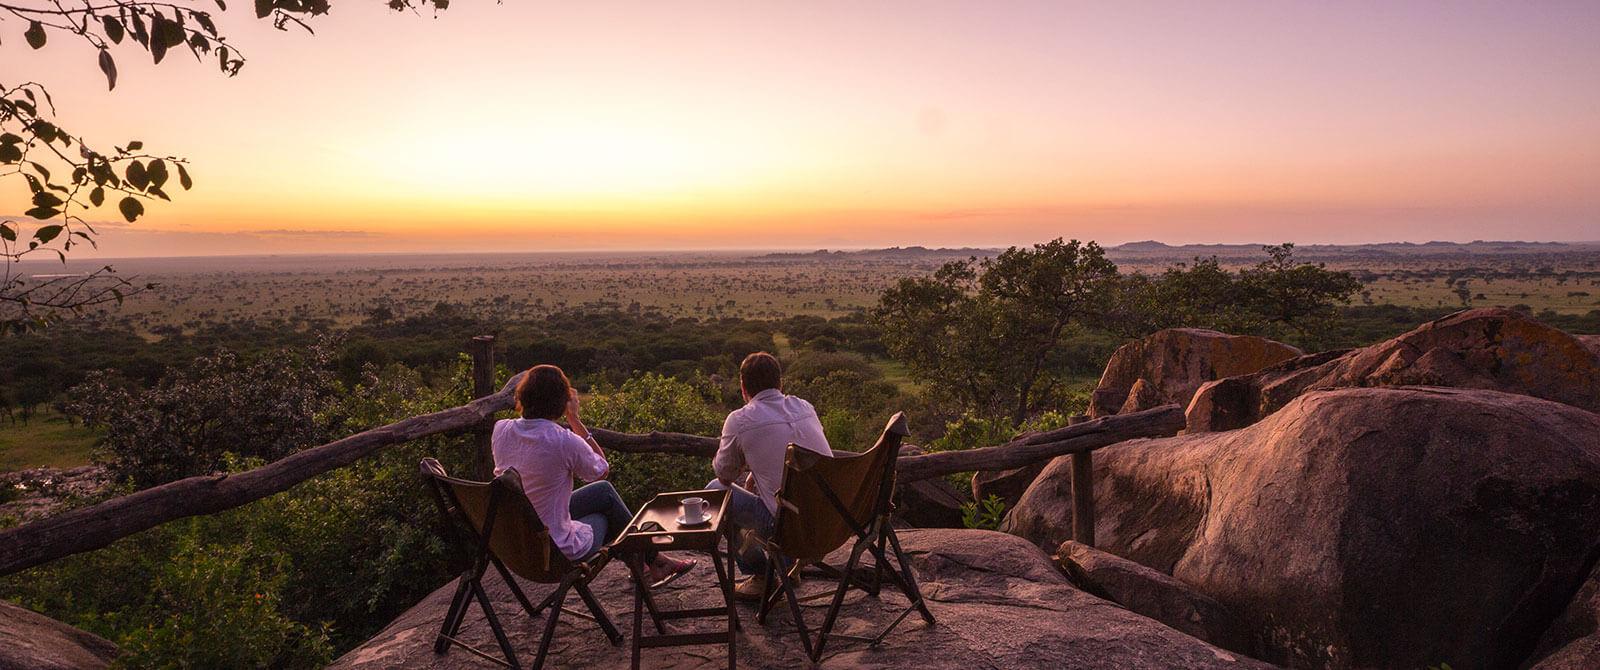 Serengeti Pioneer Camp Sunset - Great Migration Safari - Tanzania Safari Honeymoon